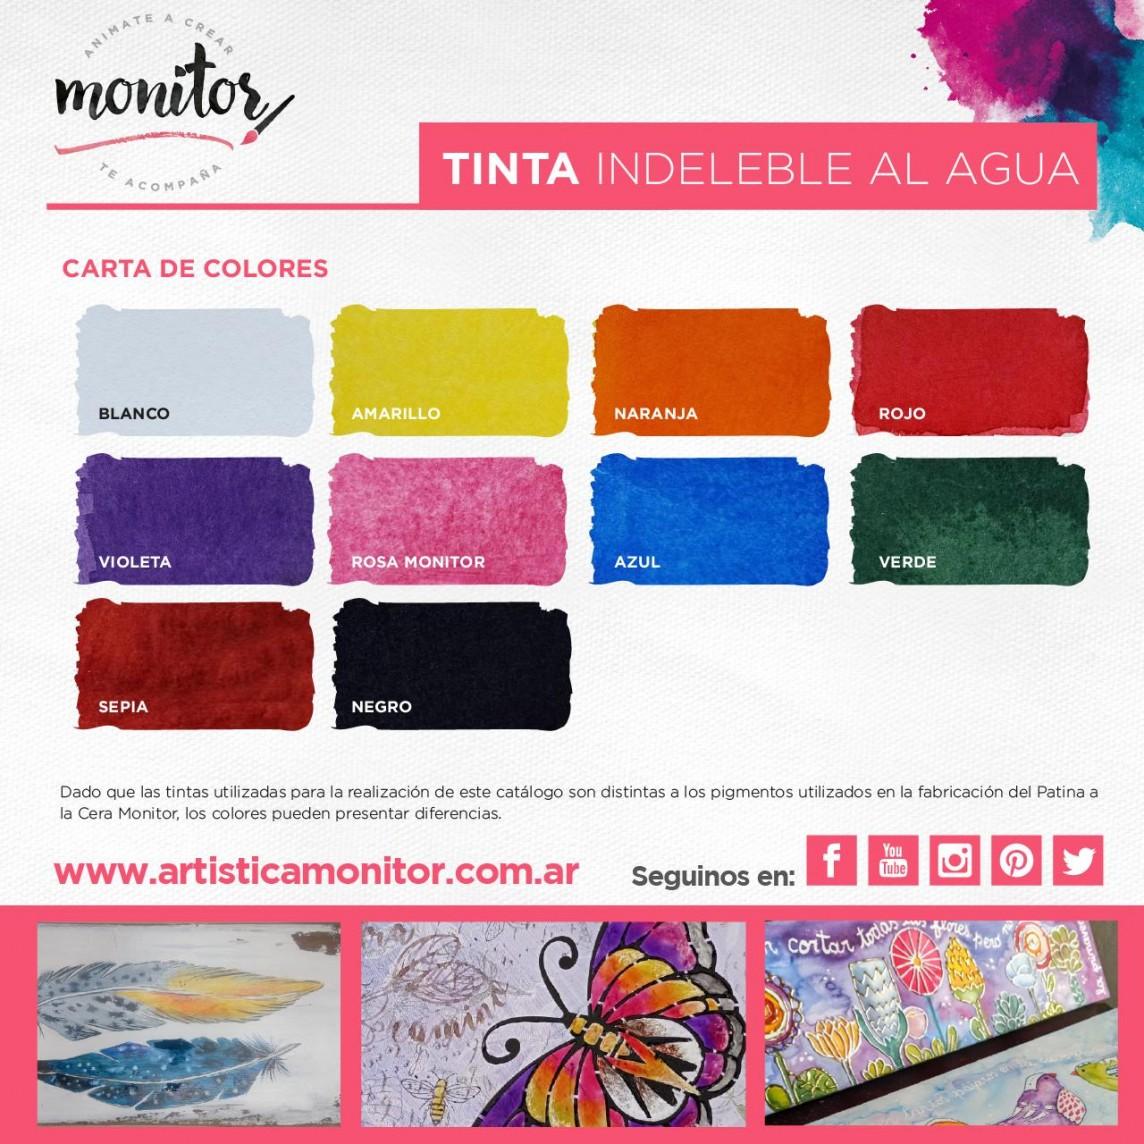 Carta de colores para Tintas Indelebles al Agua